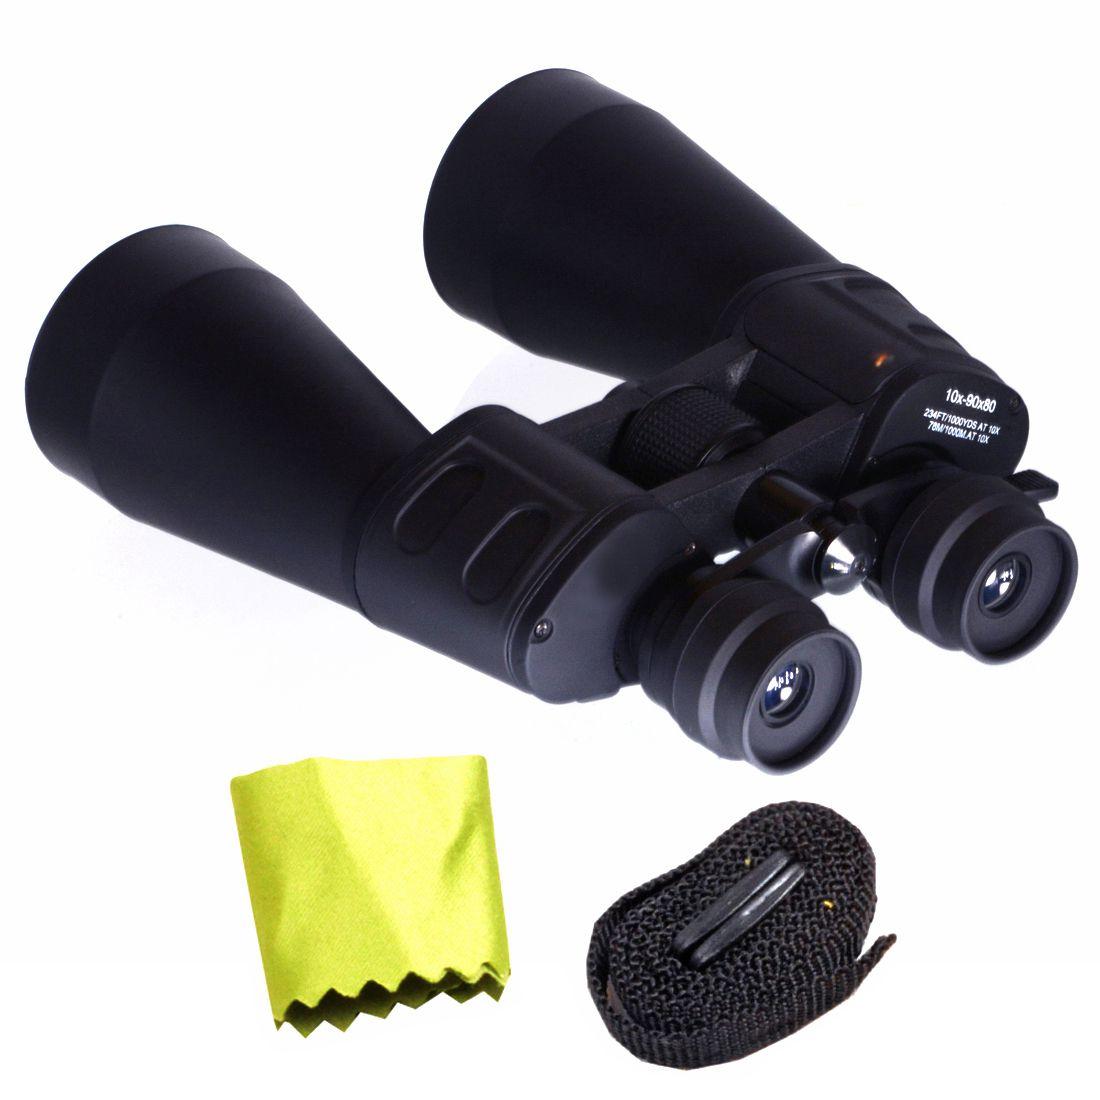 Bushnell 10-90X80 Zoom 10-90X Waterproof Prism Binocular Monocular  Telescope with Pouch